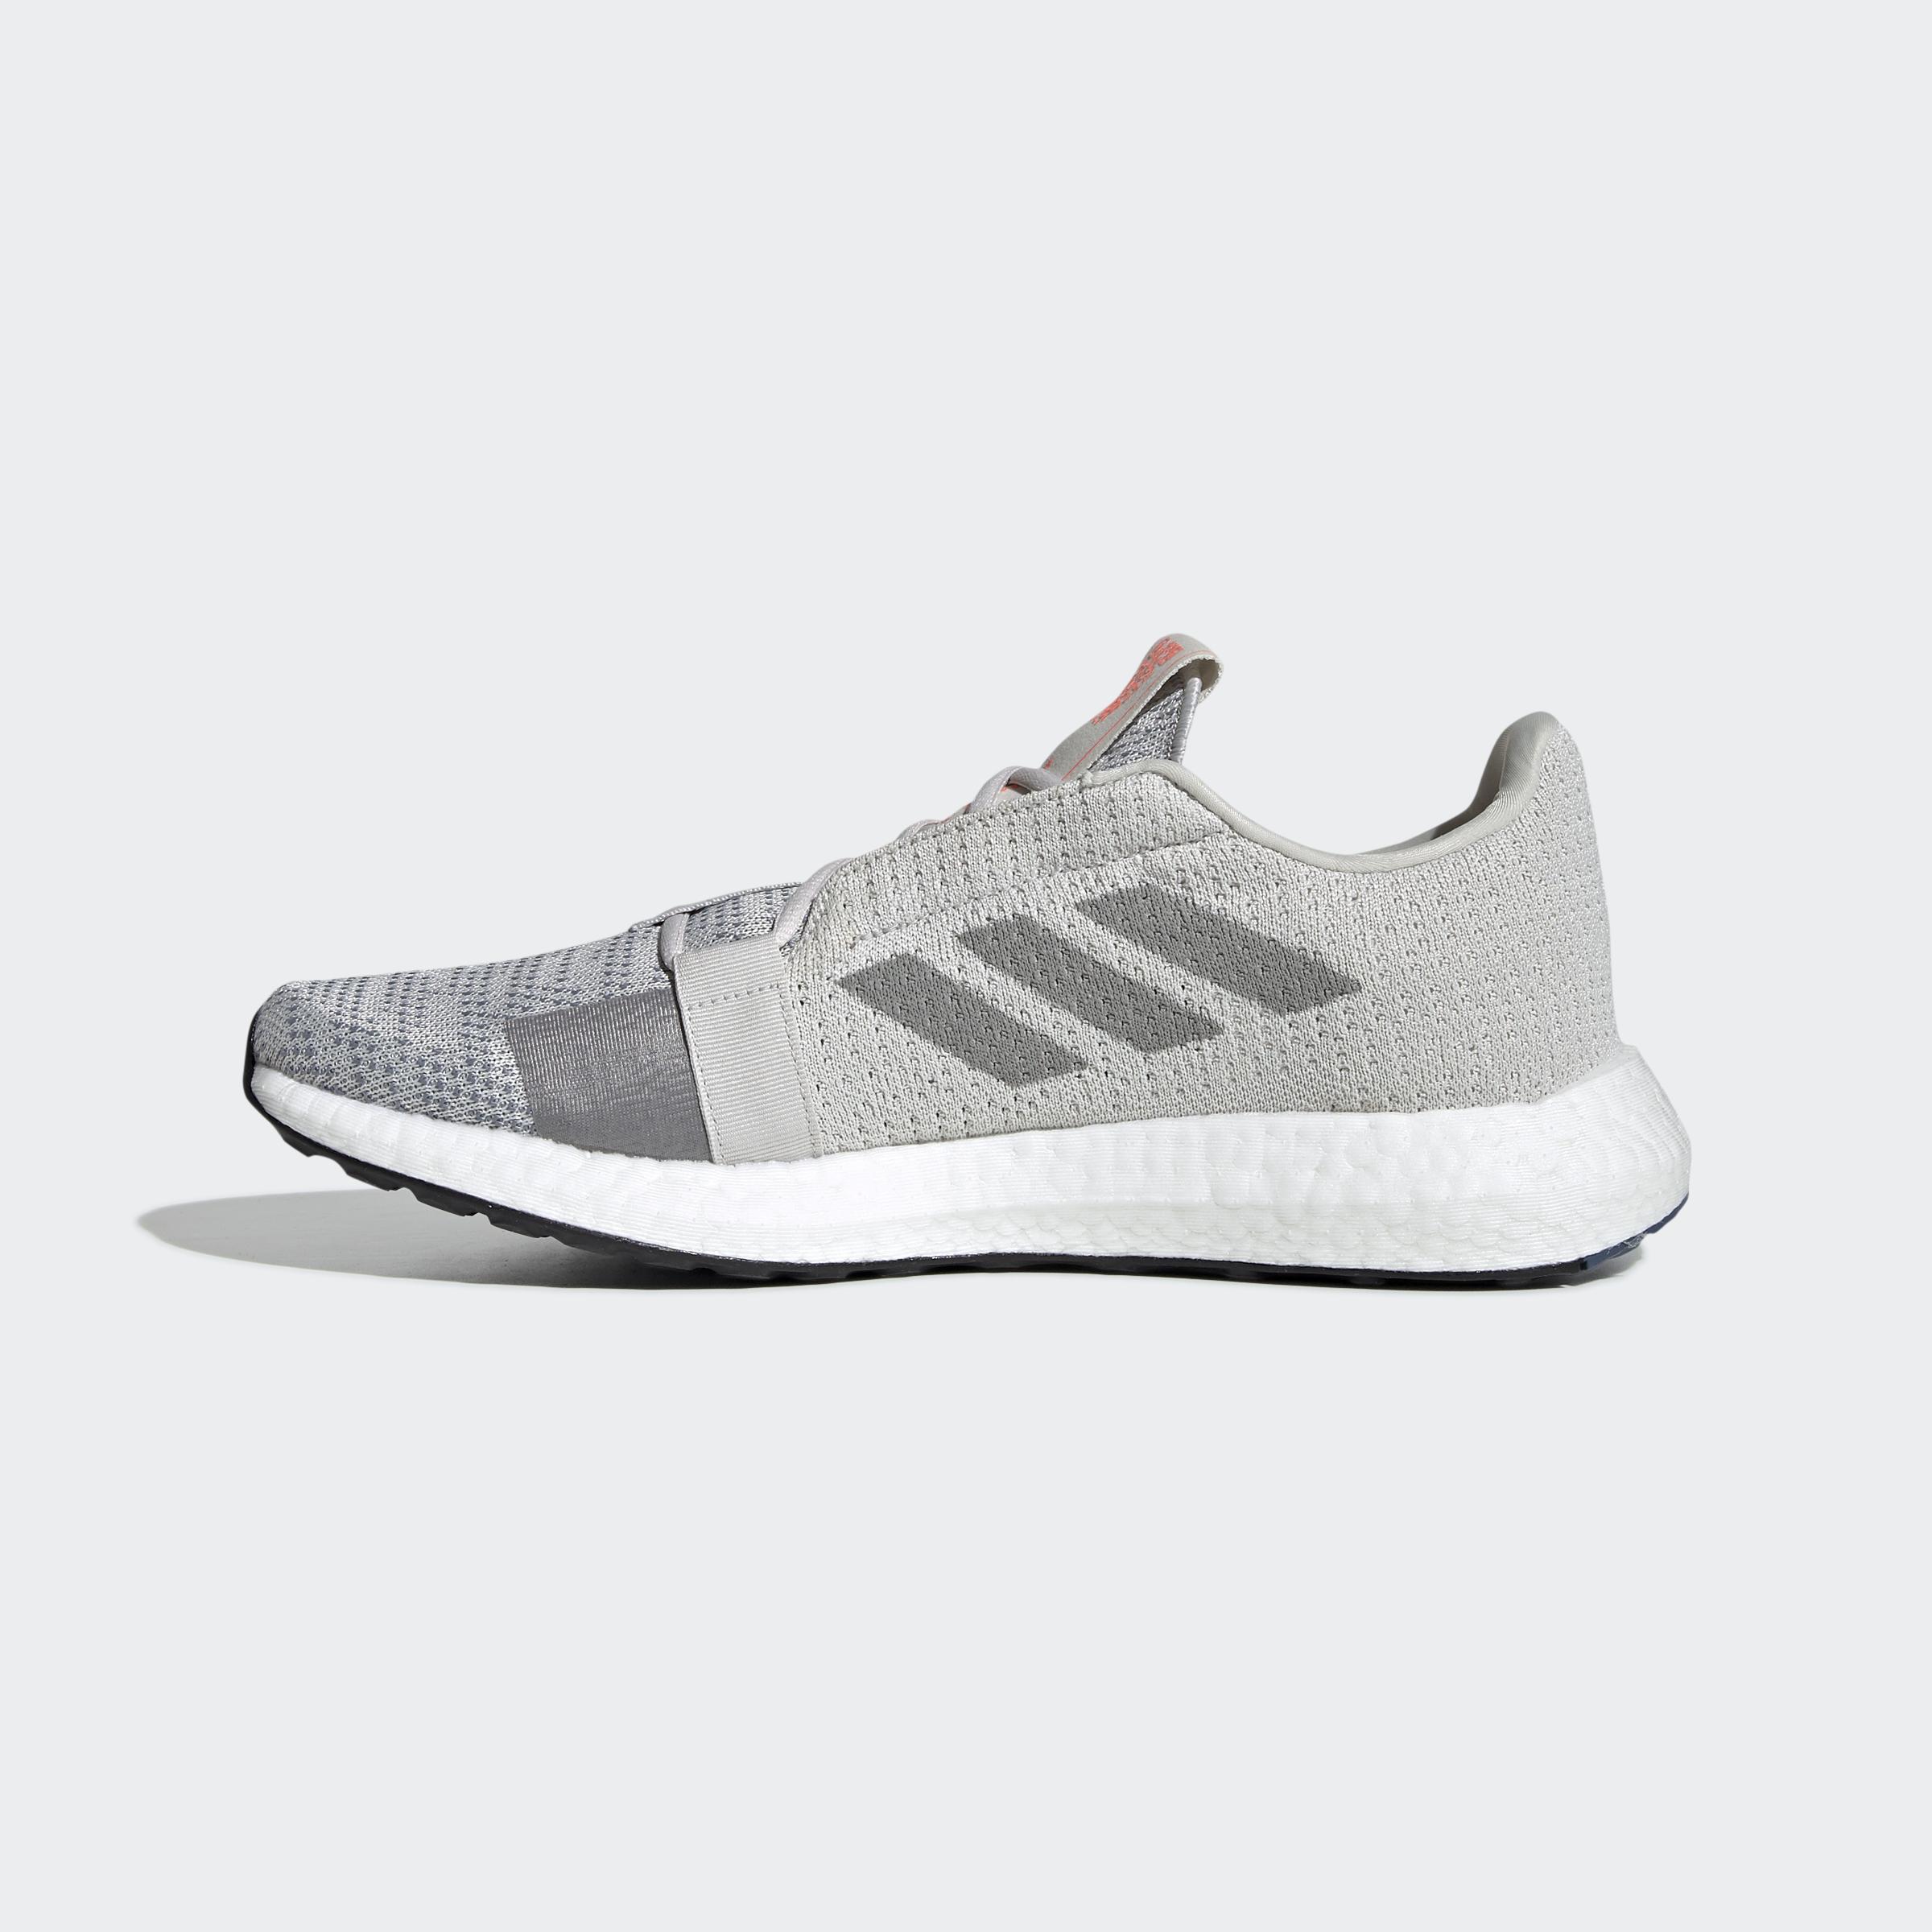 miniature 53 - adidas Senseboost Go Shoes Men's Athletic & Sneakers